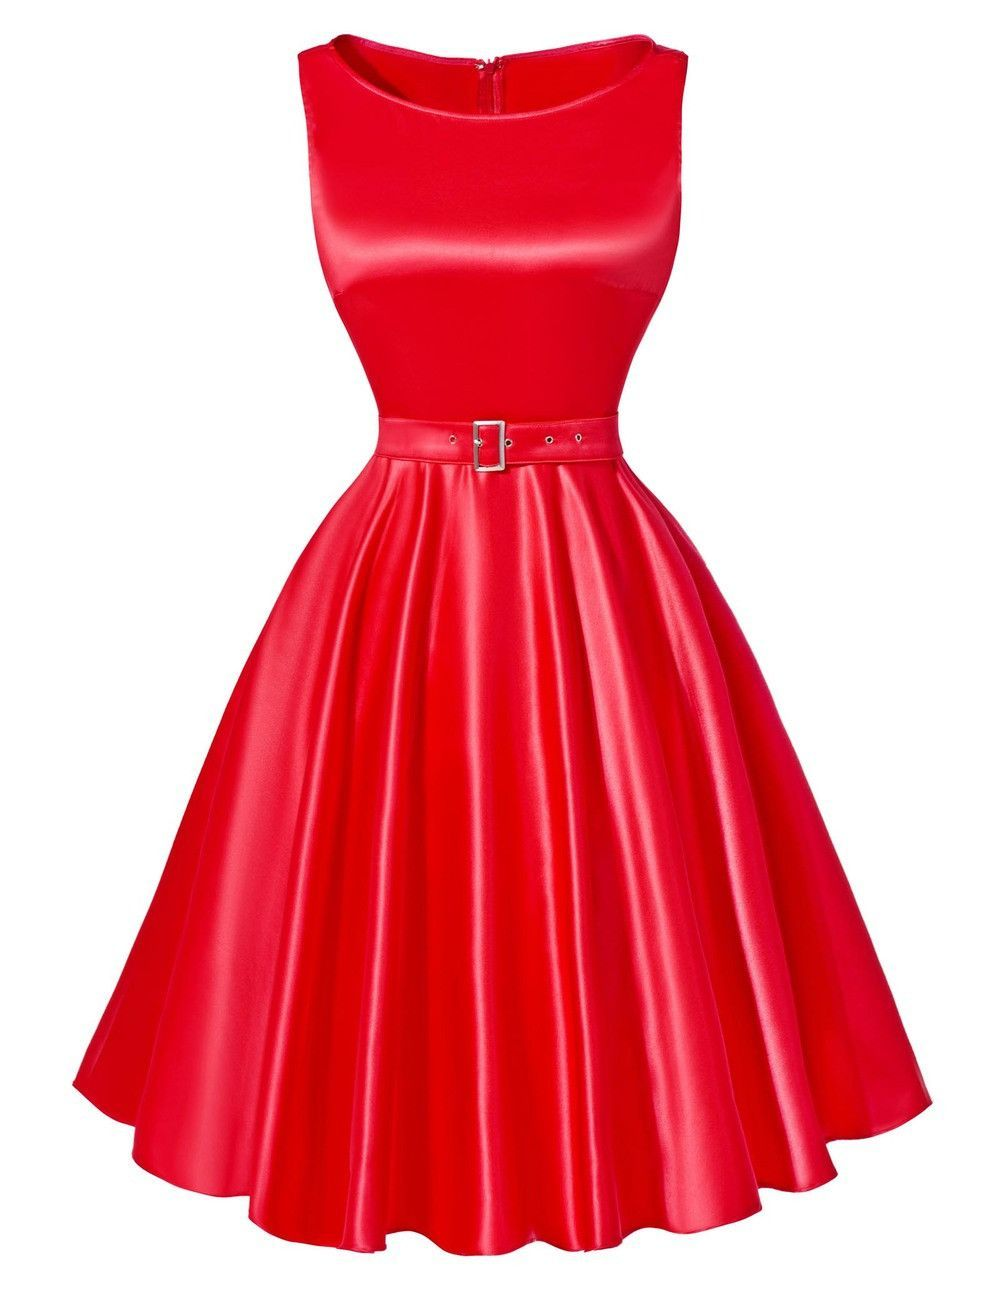 49a29987c Jurken Women Dress Black Red Purple Summer Audrey Hepburn 50s 60s Vintage  Dresses Vestidos Plus Size Rockabilly Party Dress